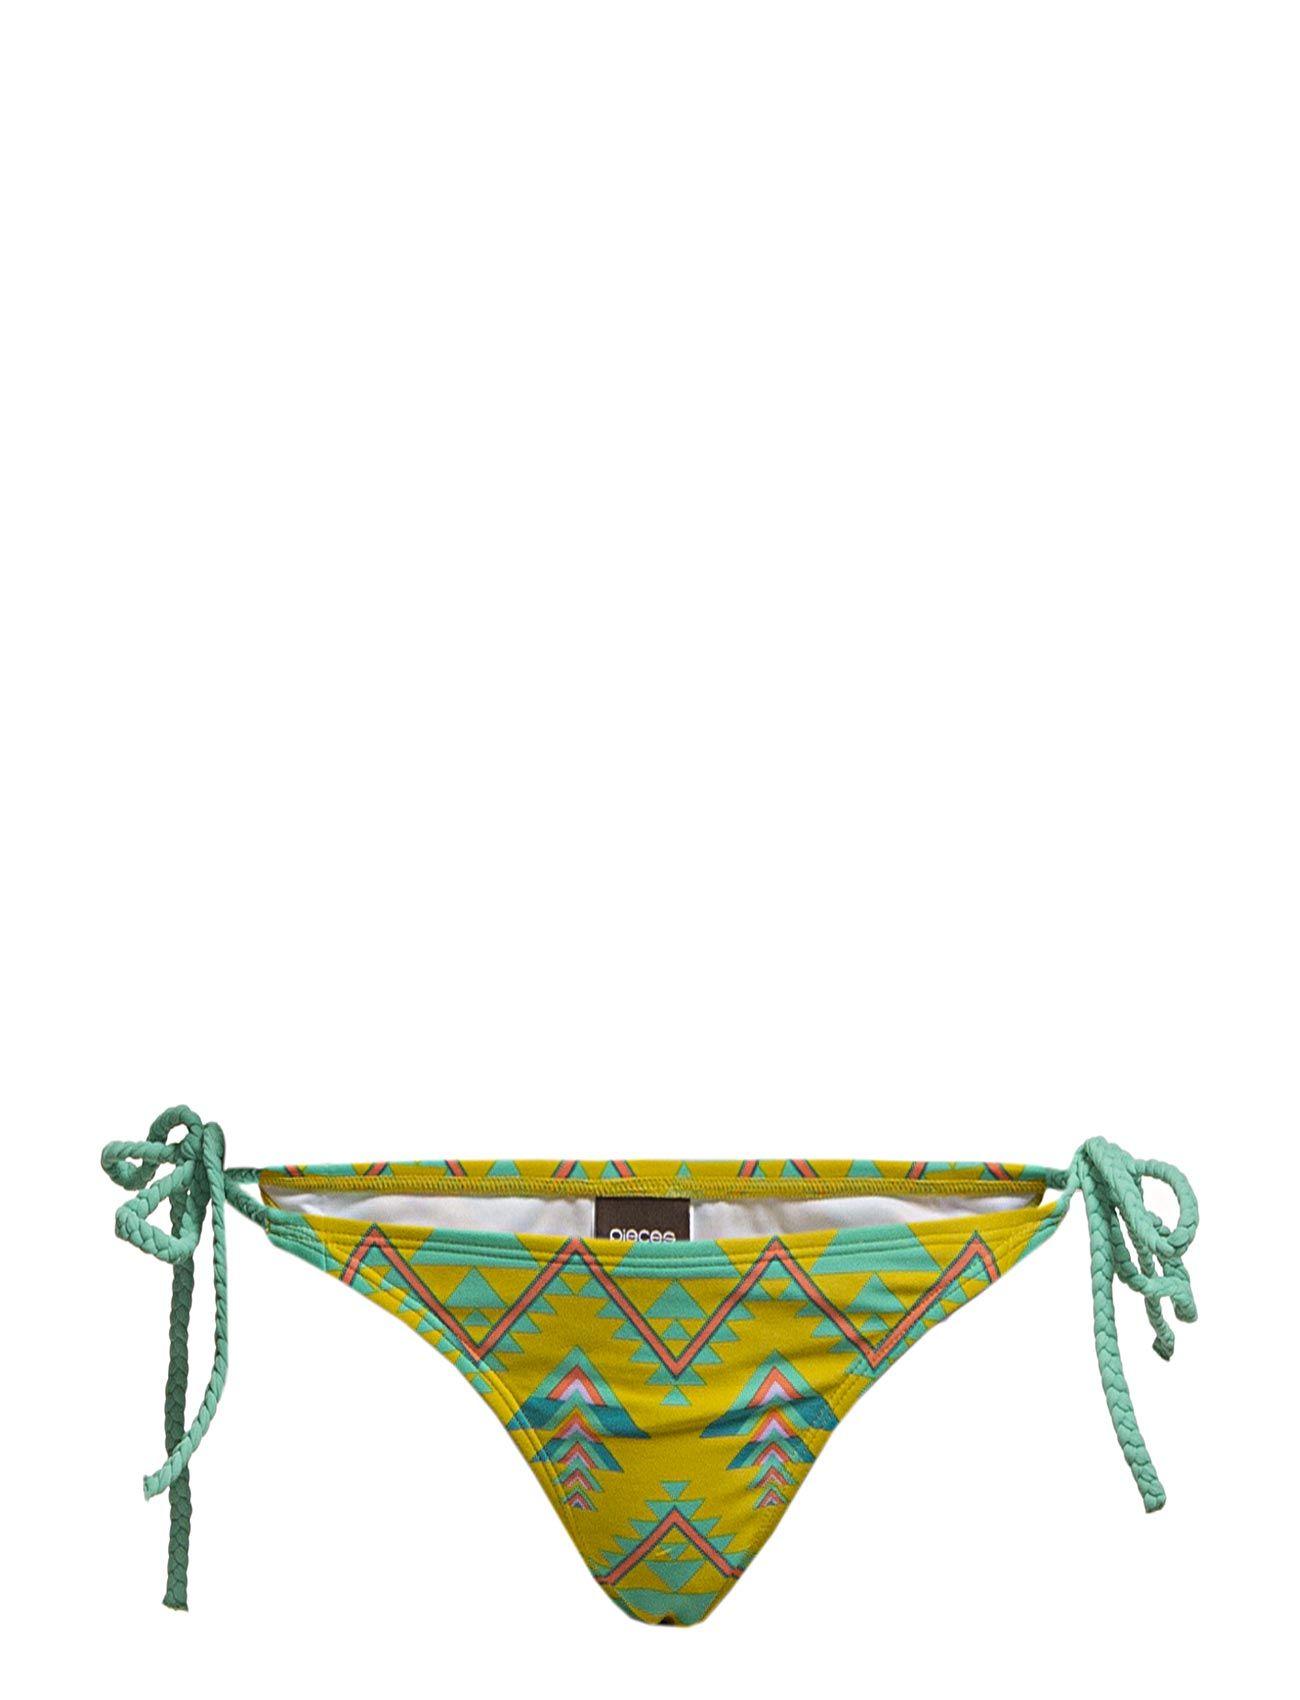 Groove Bikini Bottom